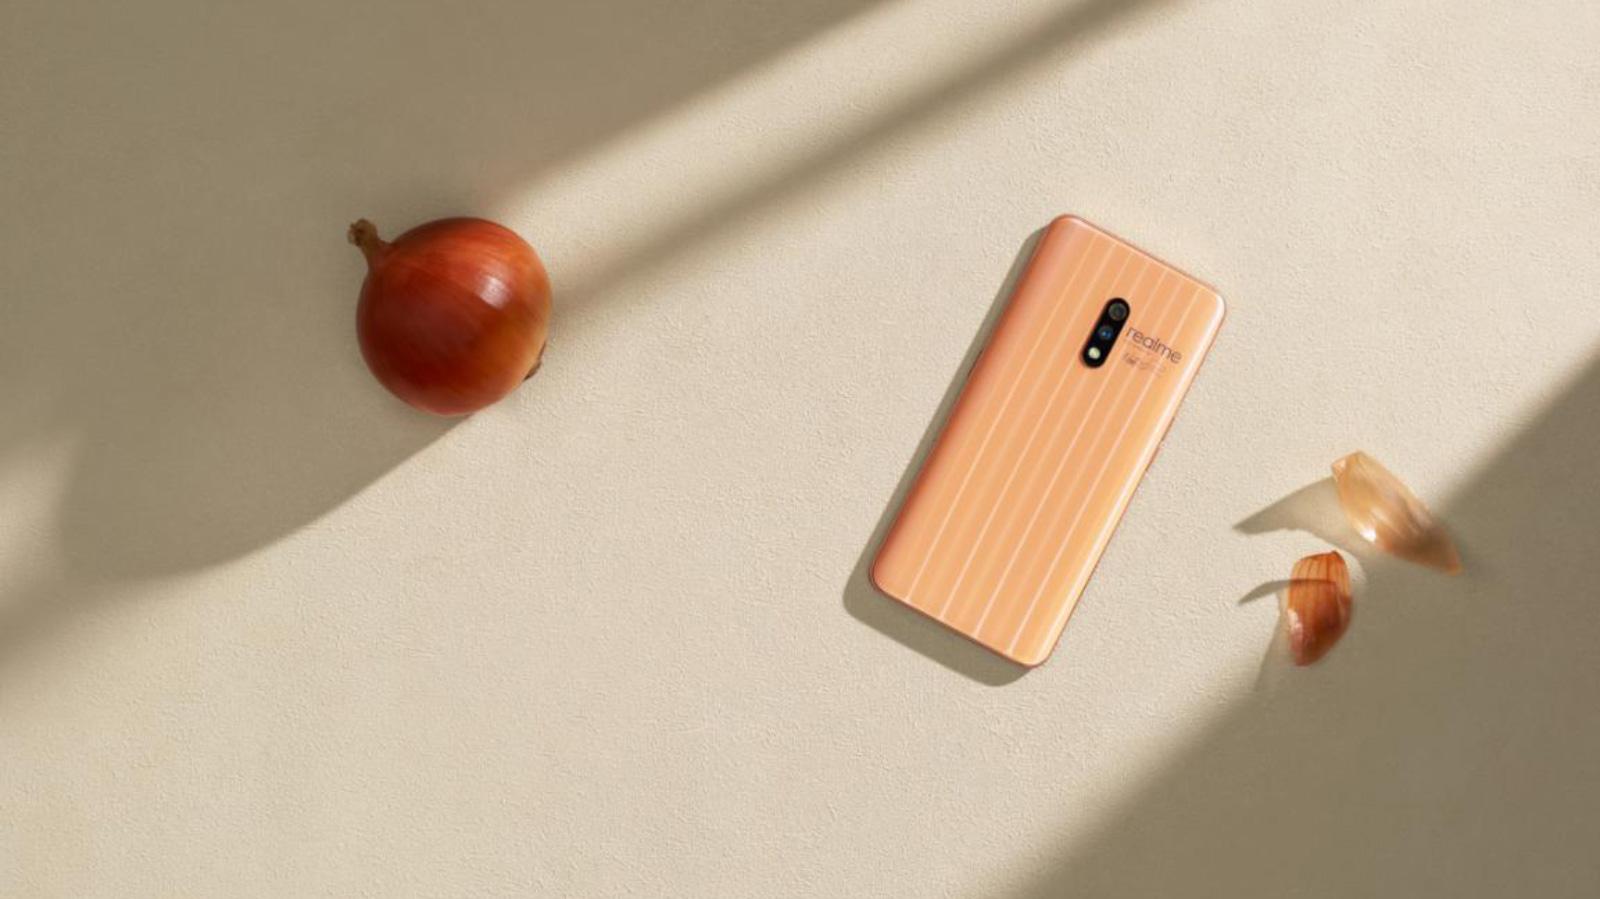 Zobacz smartfon z nagrodą Red Dot Design Award Technologia mediarun cebula smartfon red dot realme 2020